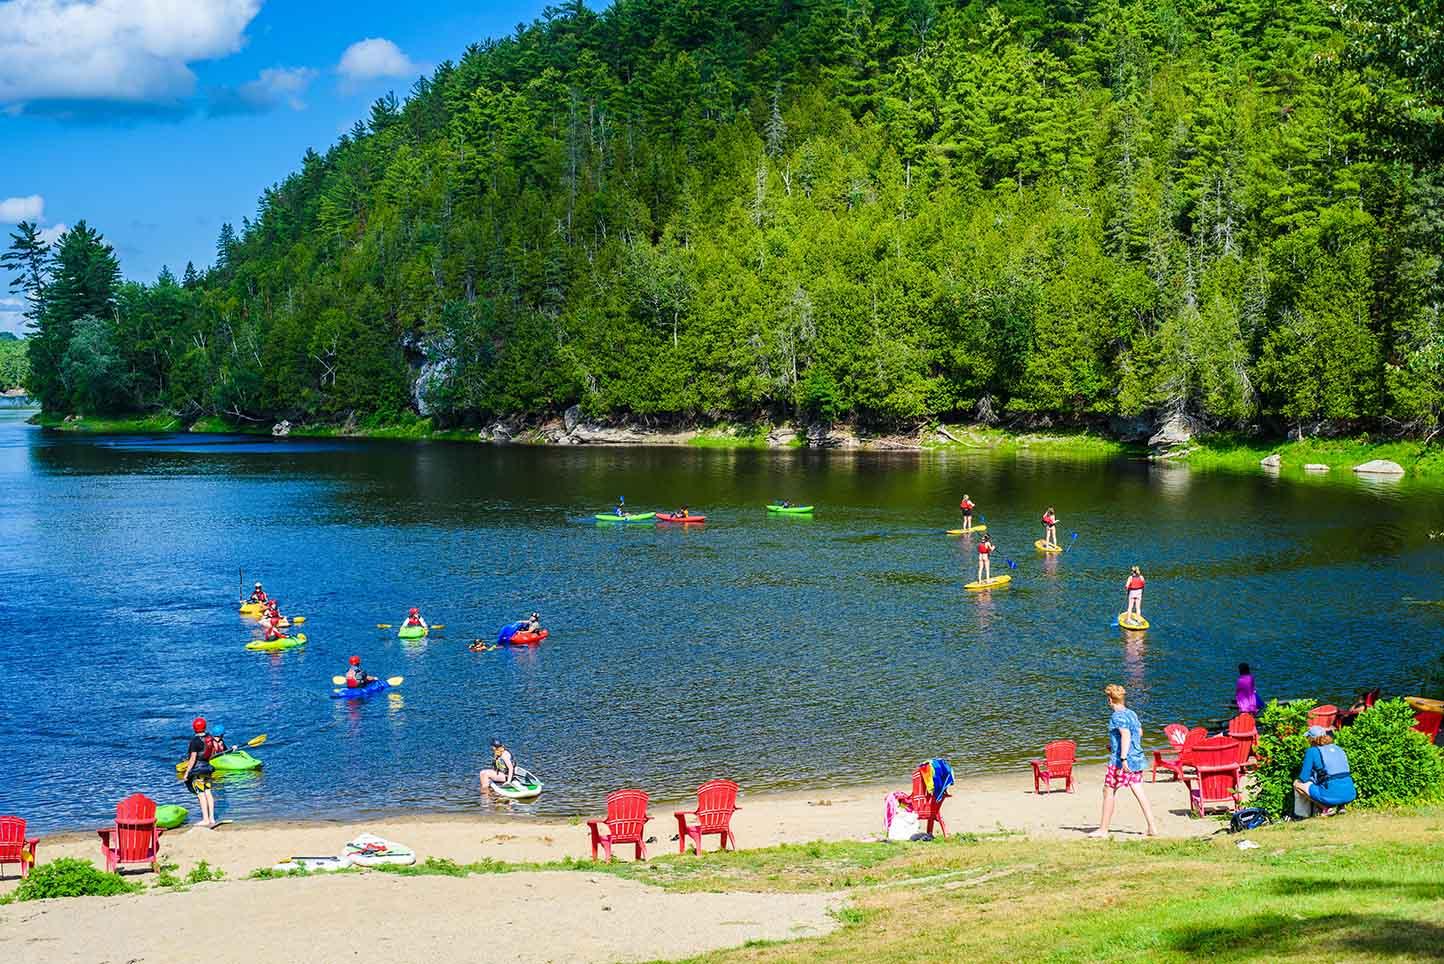 Beach Resort Activities National Whitewater Park Wilderness Tours SUP Kayaks Lounge Relax Ottawa River Ontario Canada Best Summer Vacation